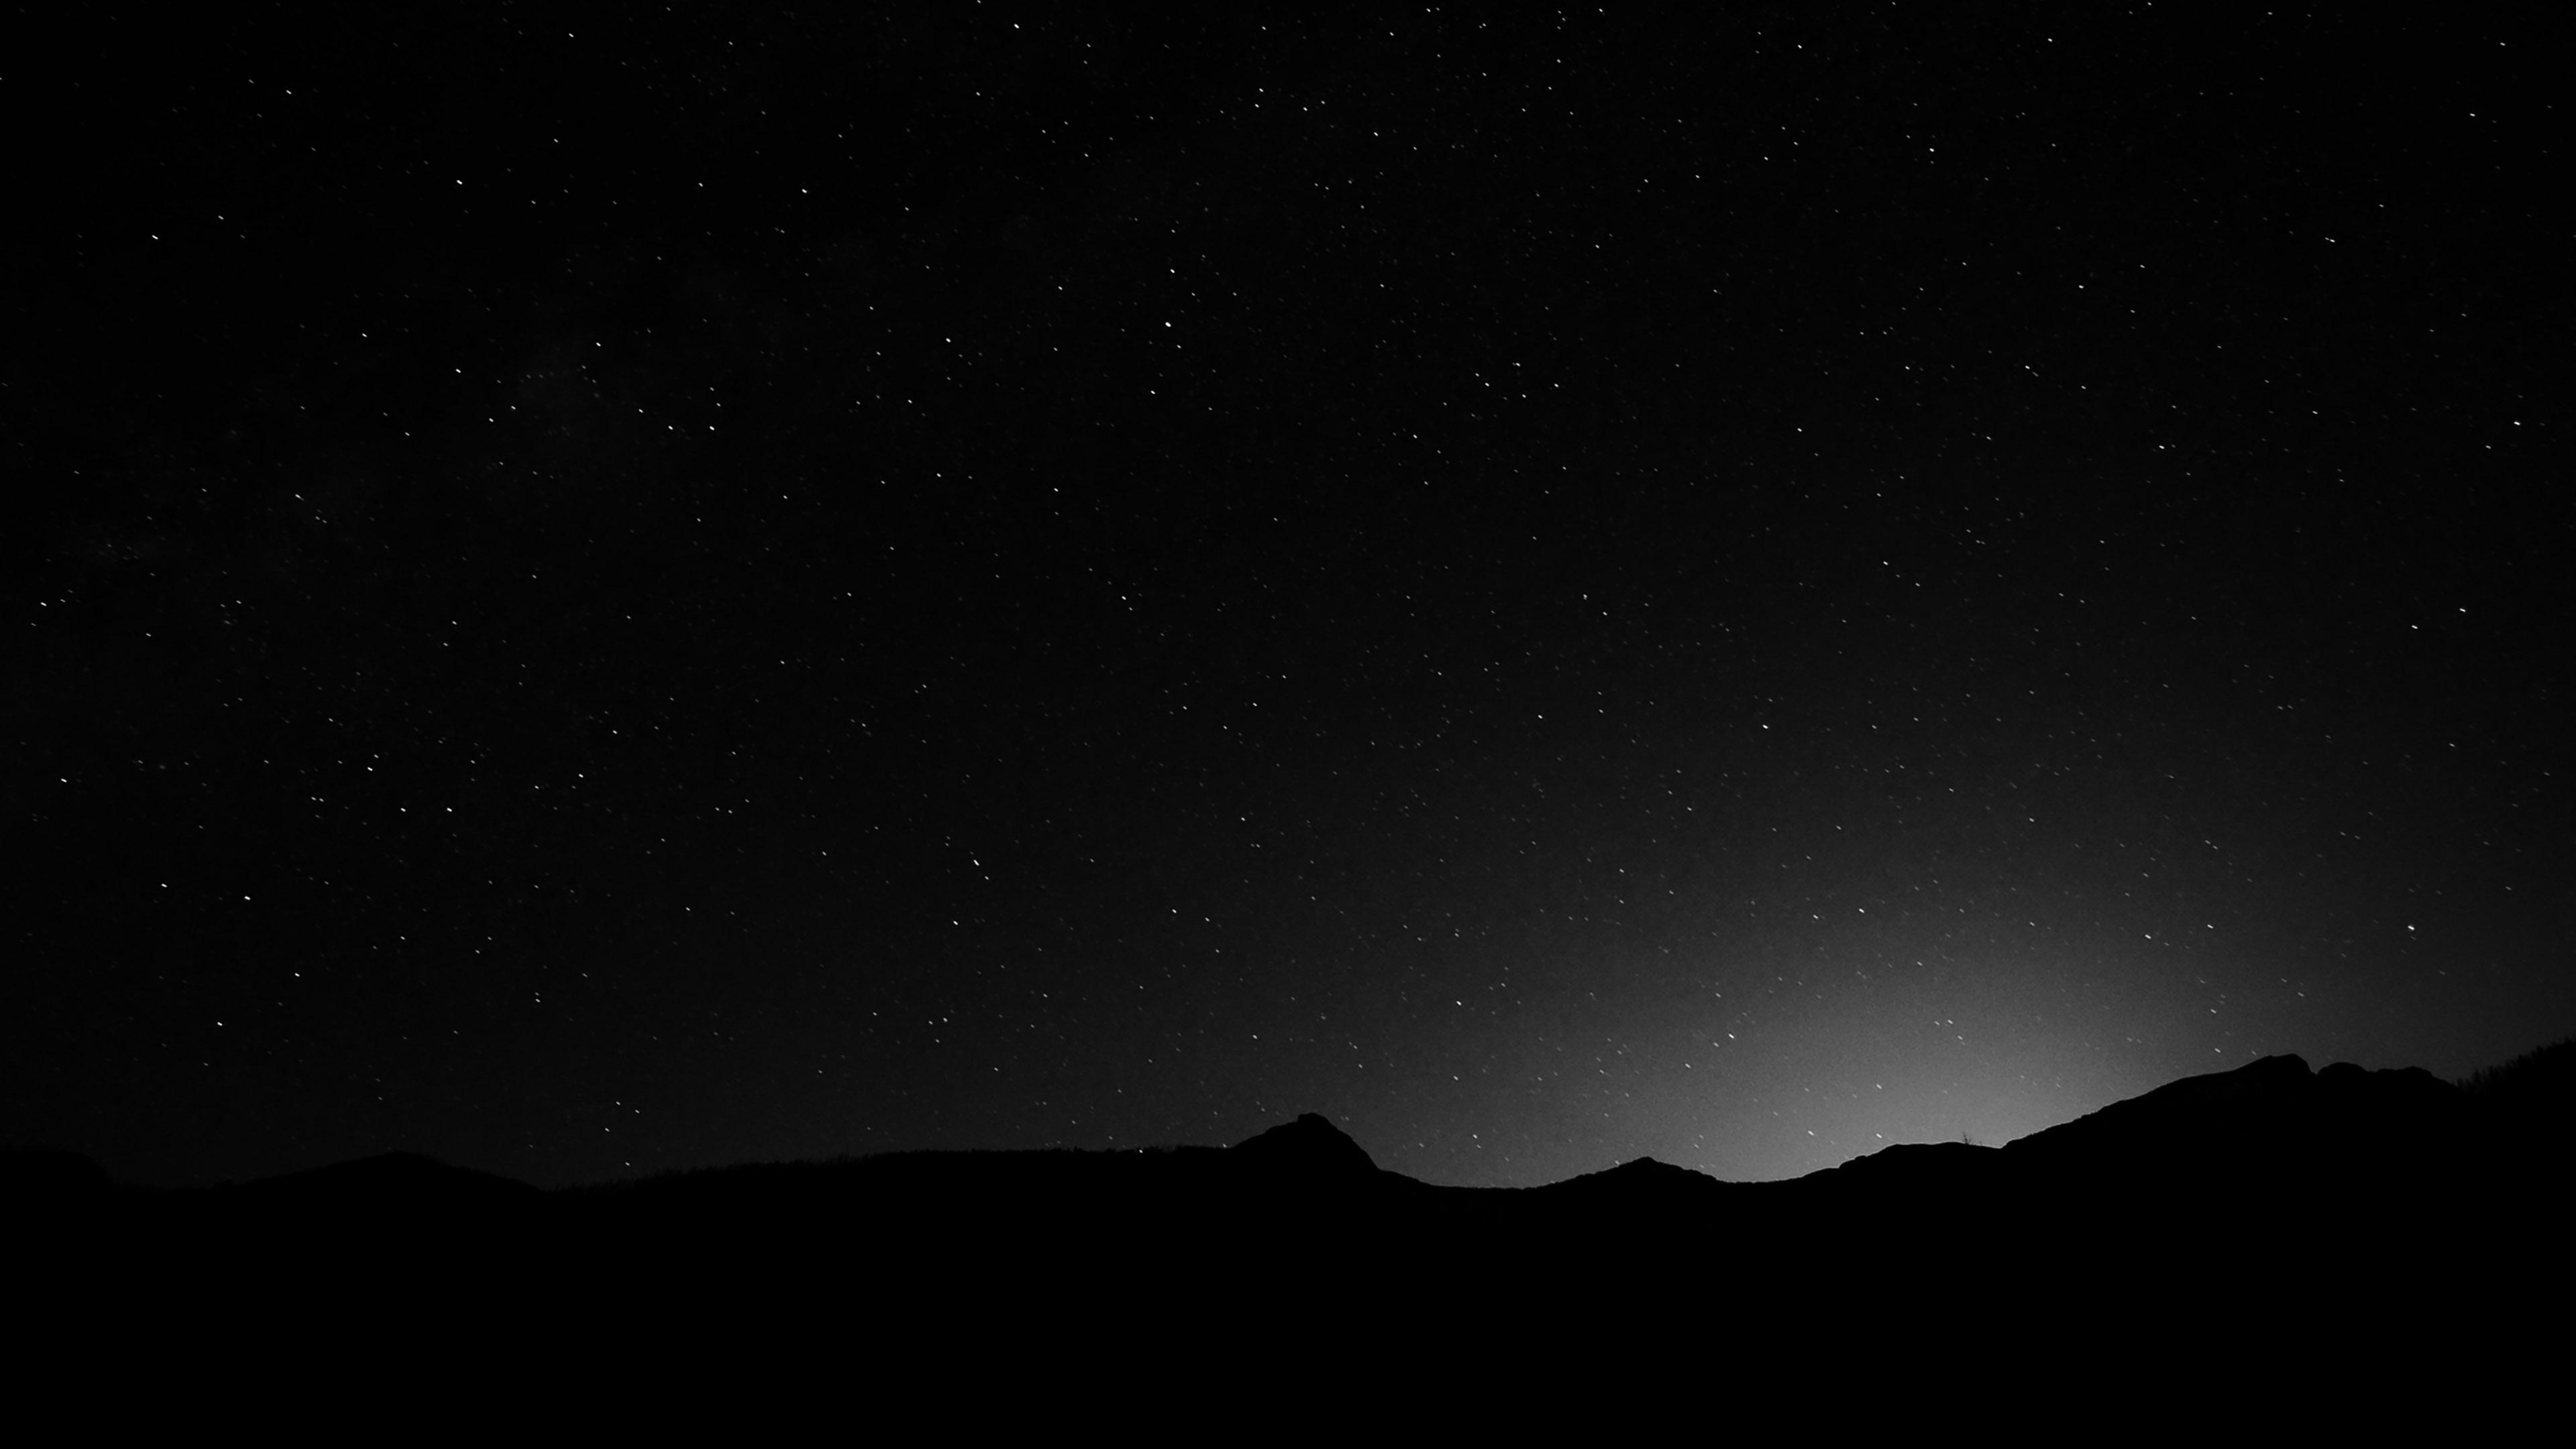 Night Sky over the Mountains Black White 4K Wallpaper 3840x2160